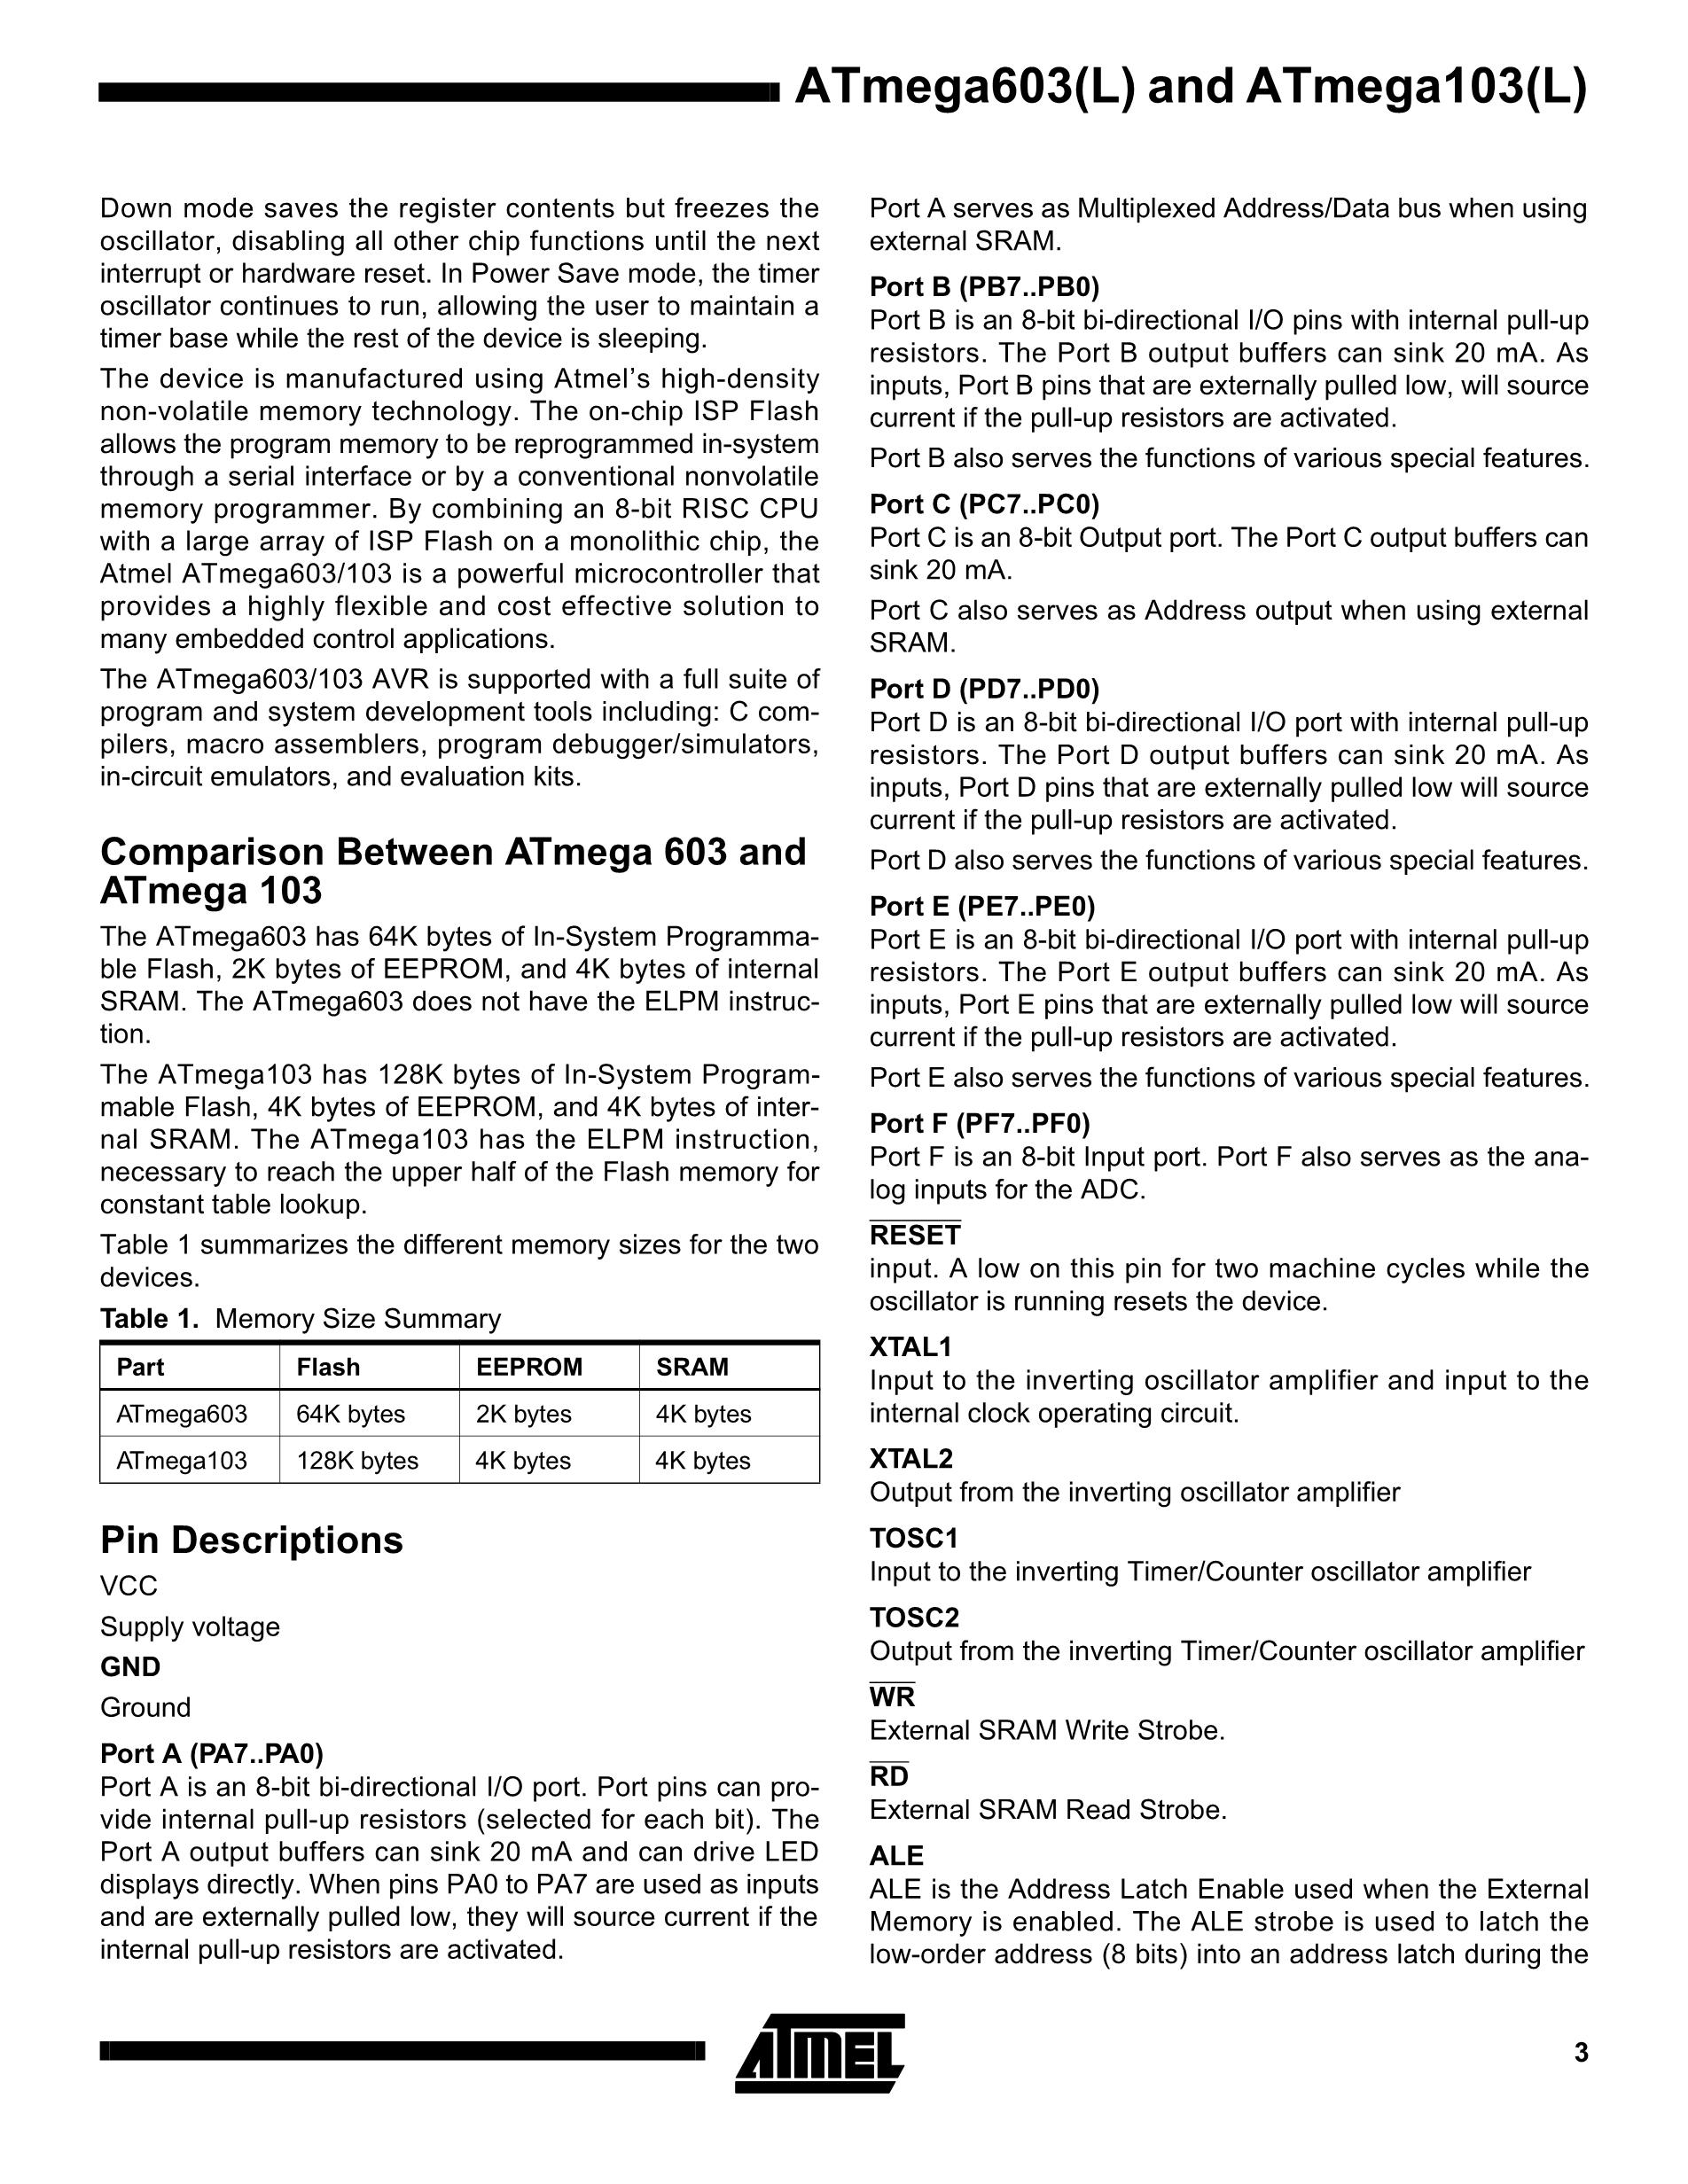 ATMEGA16U2-AU AVRVR ATMEGA8-BIT 16MHZ 16KB (8K X 16) FLASH 32-TQFP (7X7) 's pdf picture 3